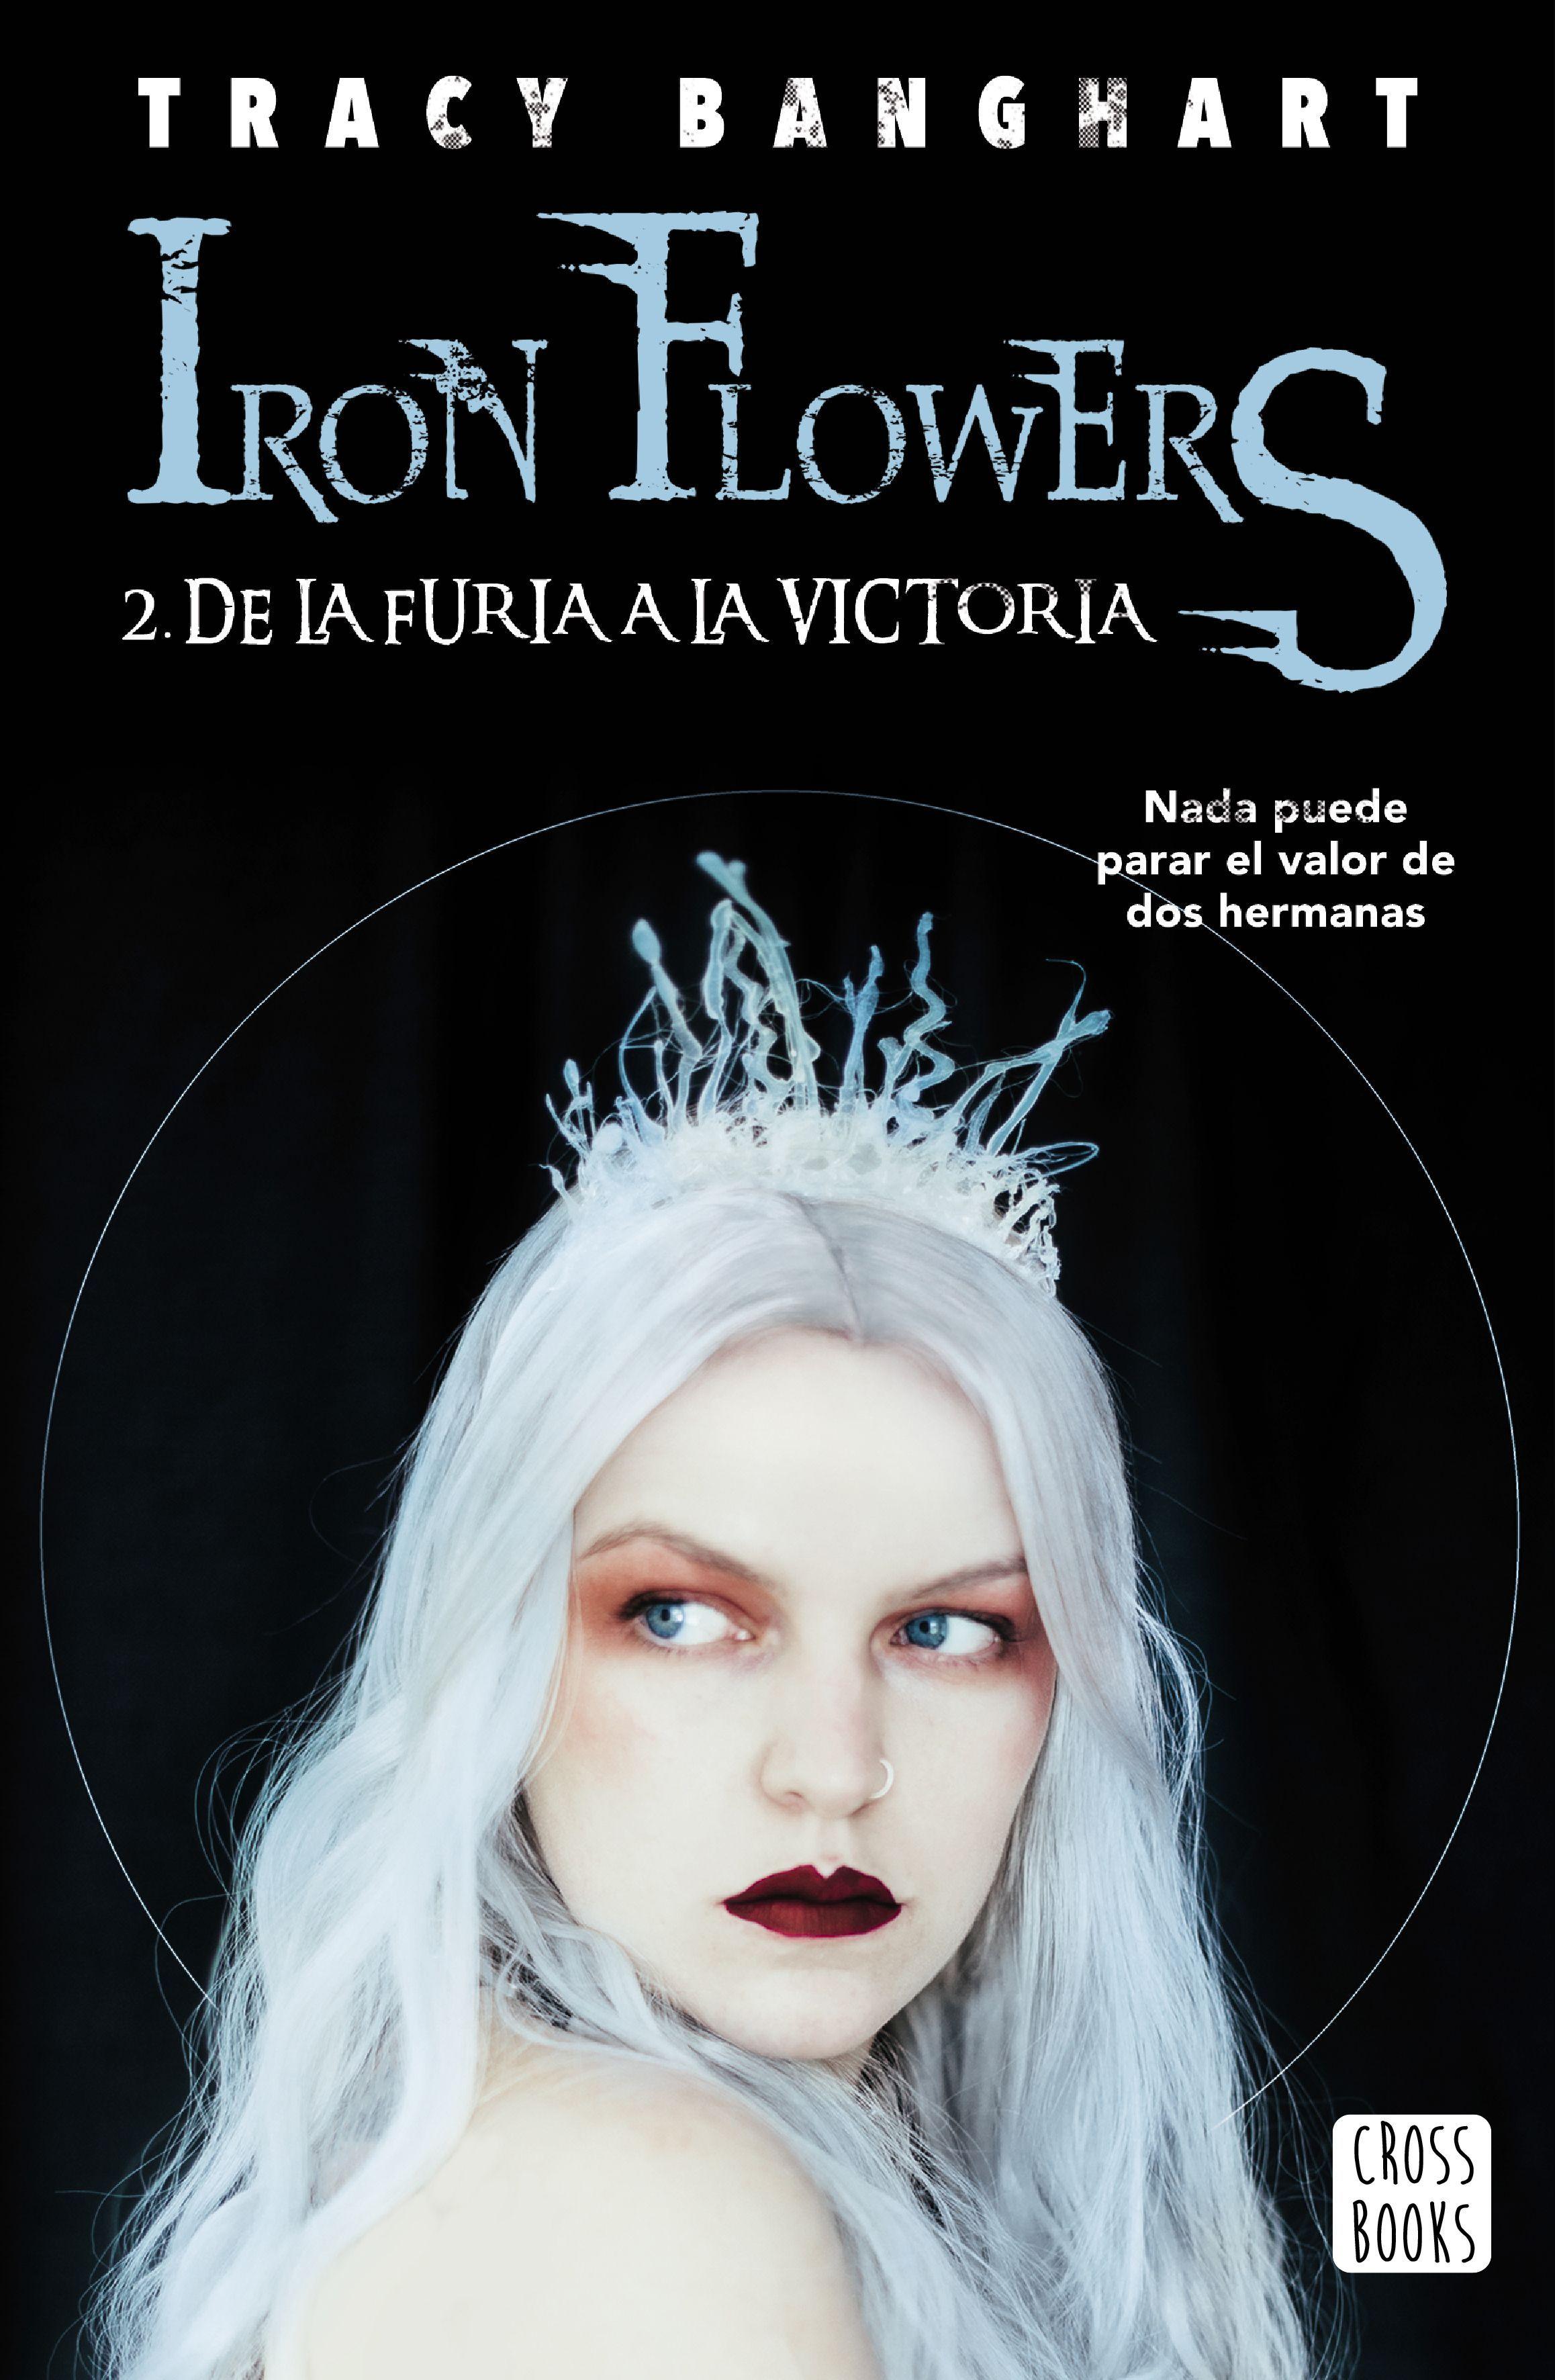 IRON FLOWERS 2 DE LA FURIA A LA VICTORIA